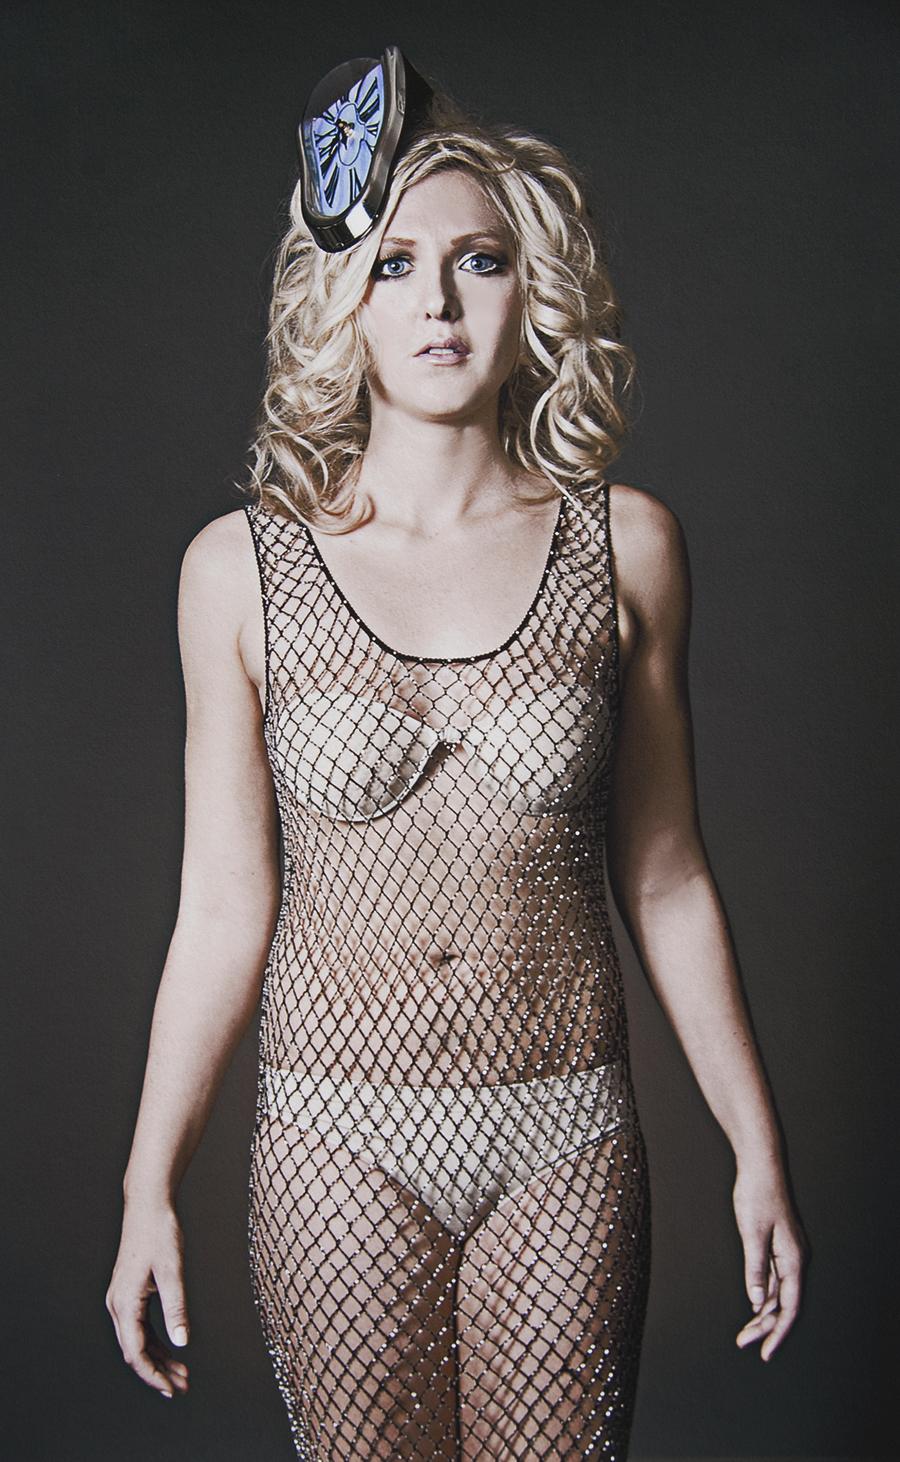 Tony_Ward_fashion_photography_model_Dyana_Baurley_Heidi_lee_miliner_New_York_fishnet_bodysuit_beige_bra_panty_set_melting_clock_Dali_inspiration_portrait